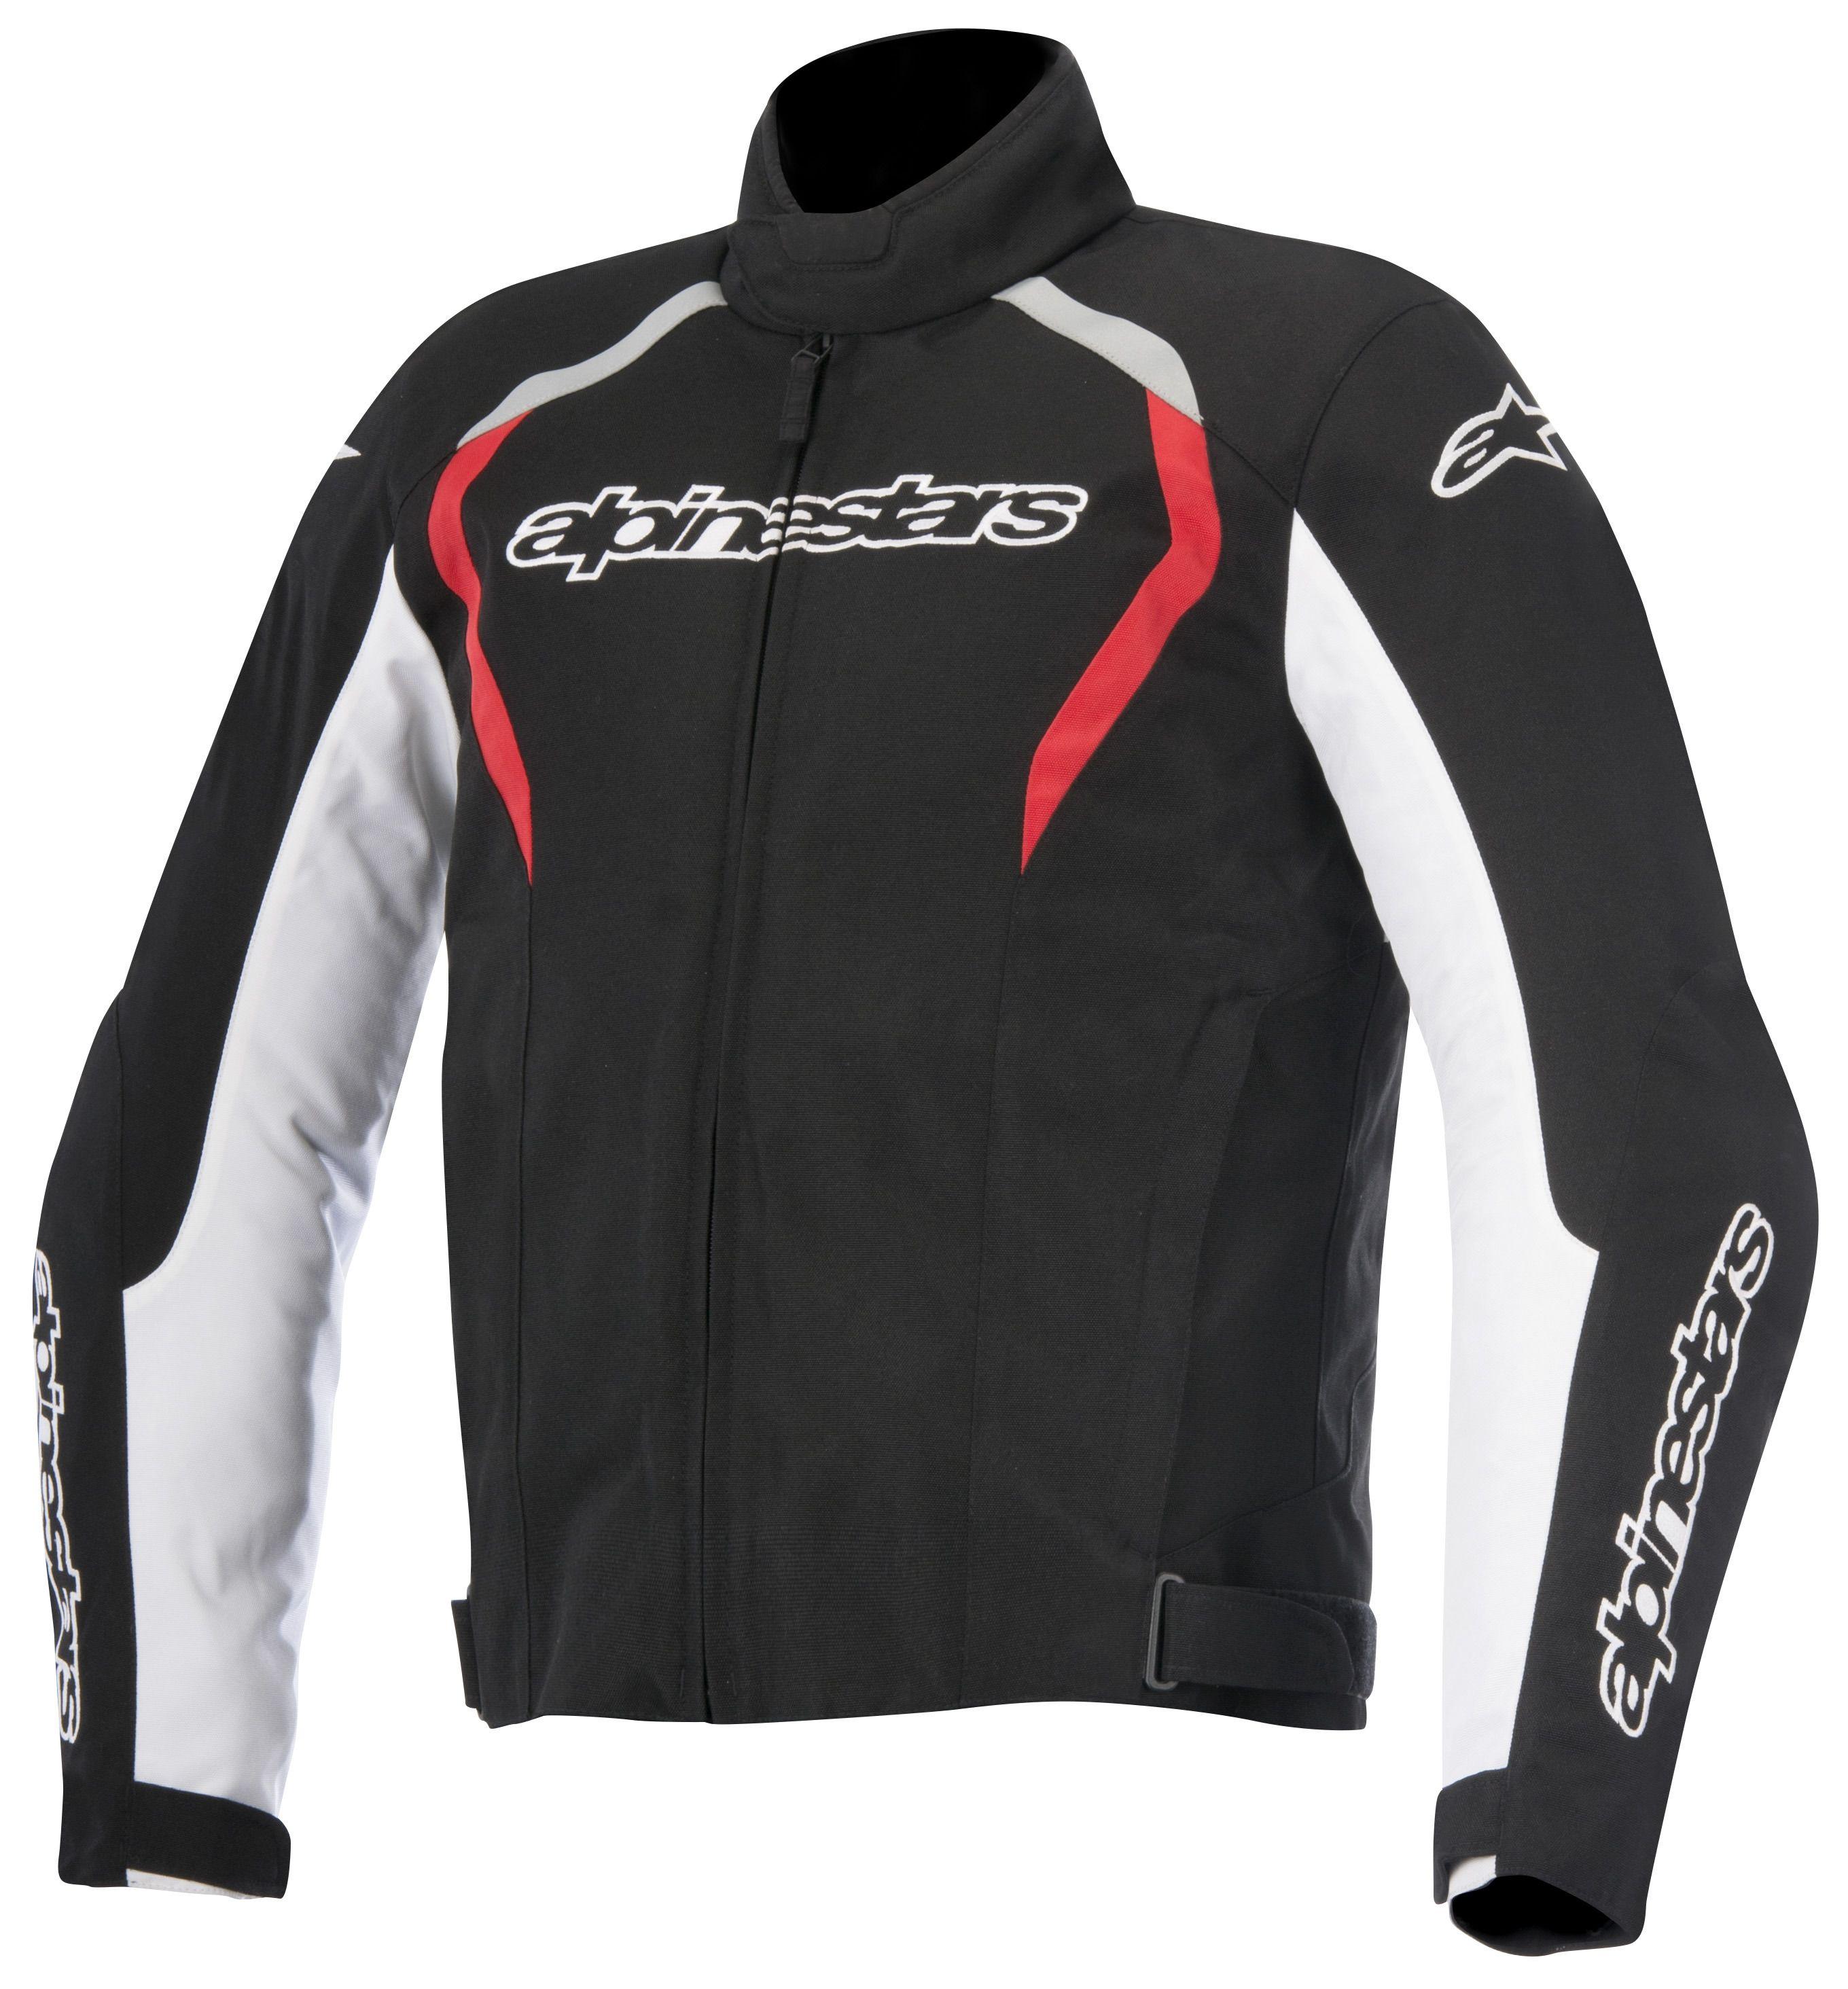 Alpine Motorcycle Gear >> Alpinestars Fastback Wp Jacket 30 68 98 Off Revzilla